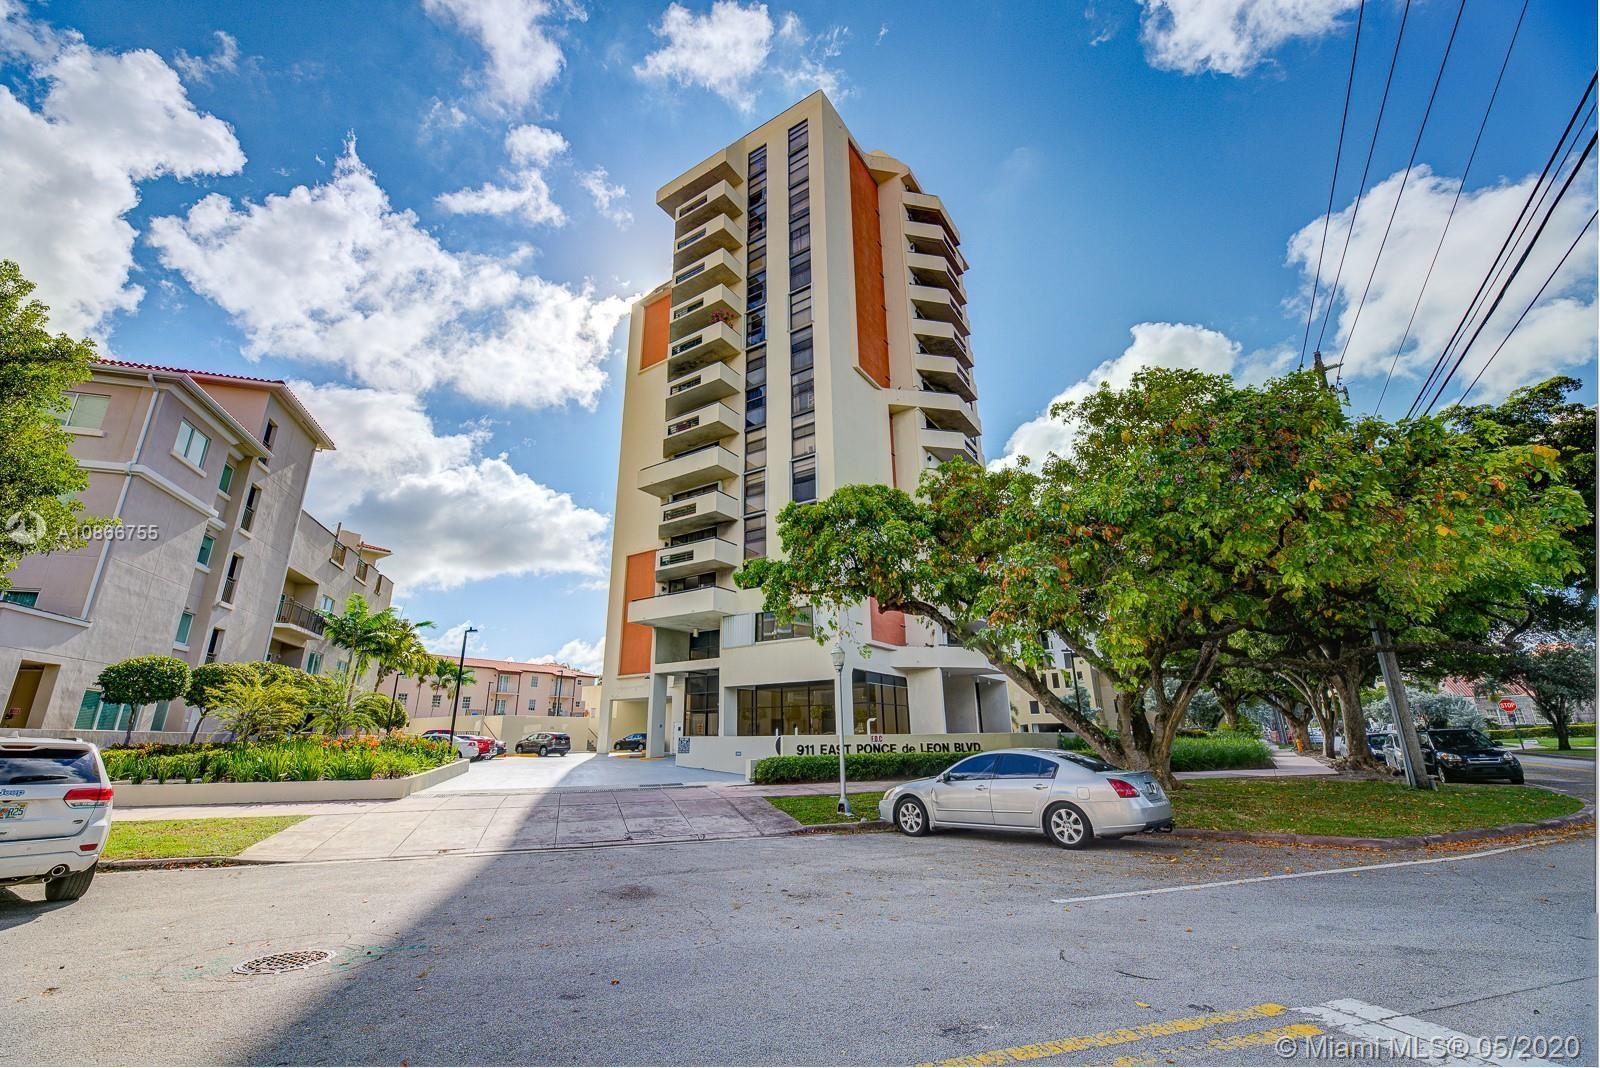 911 E Ponce De Leon Blvd #1104, Coral Gables, FL 33134 - #: A10866755